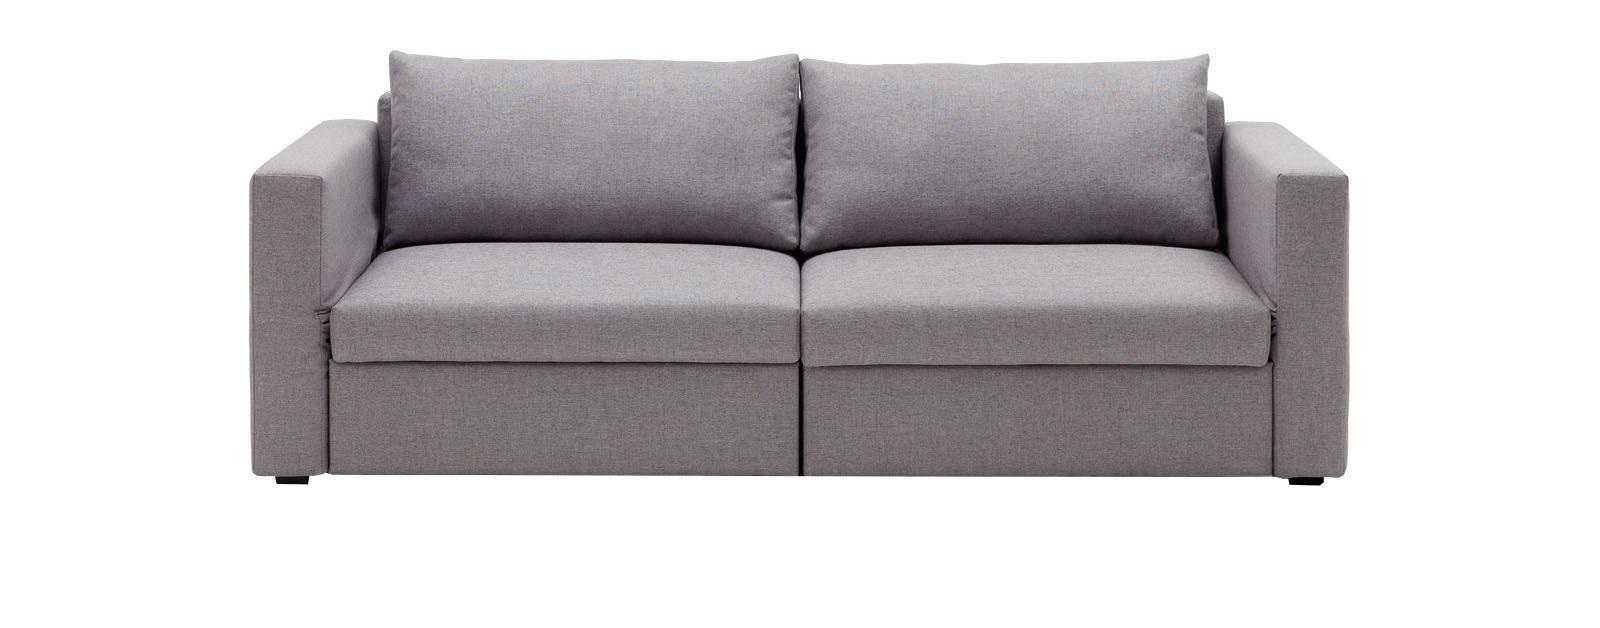 Entzuckend Schlafsofa Ausziehbar Couch Mobel Sofa Couch Sofa Bed